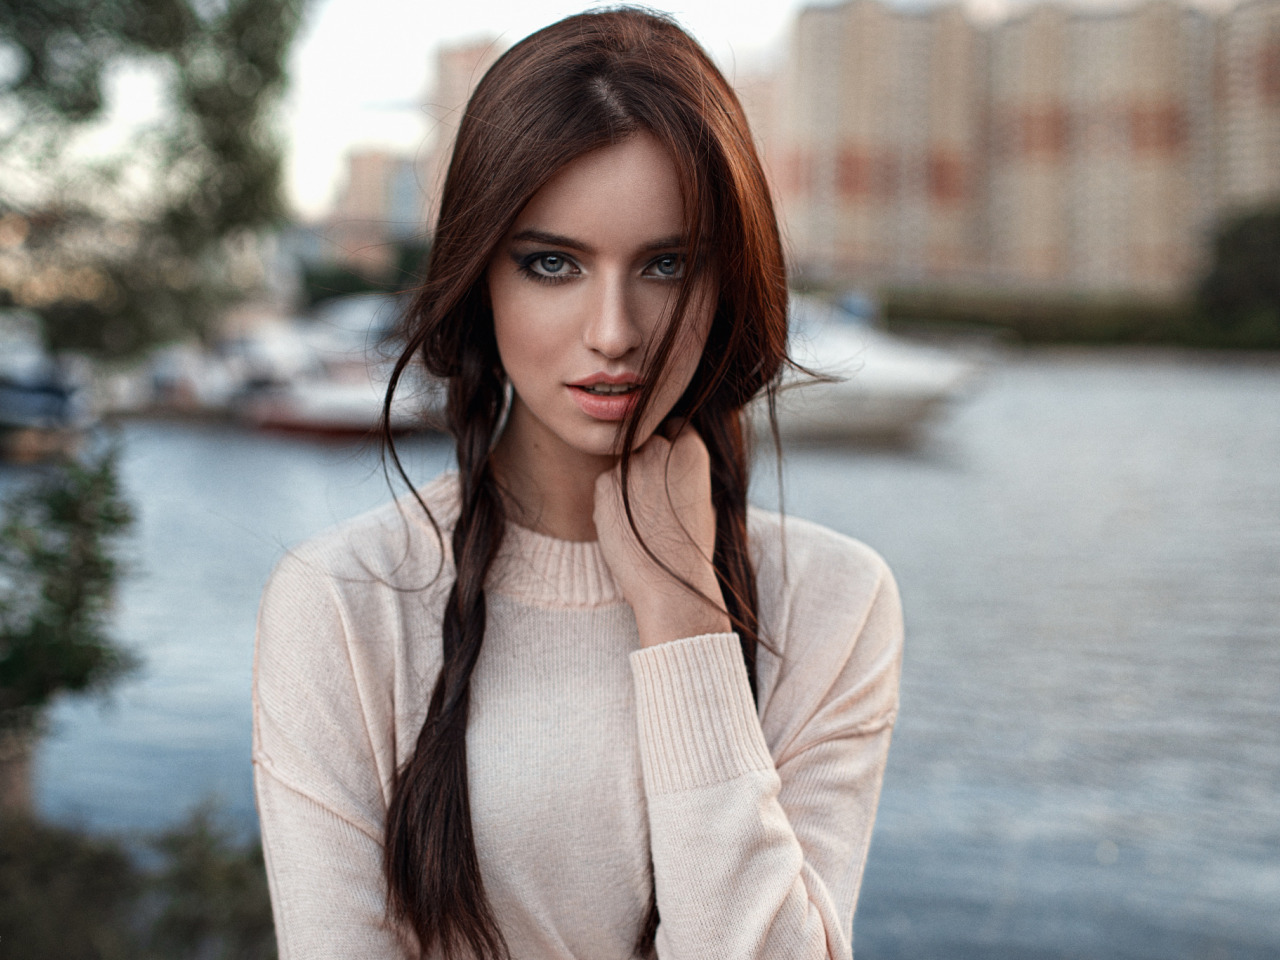 https://img2.goodfon.ru/original/1280x960/4/72/devushka-anastasiya-malahova.jpg